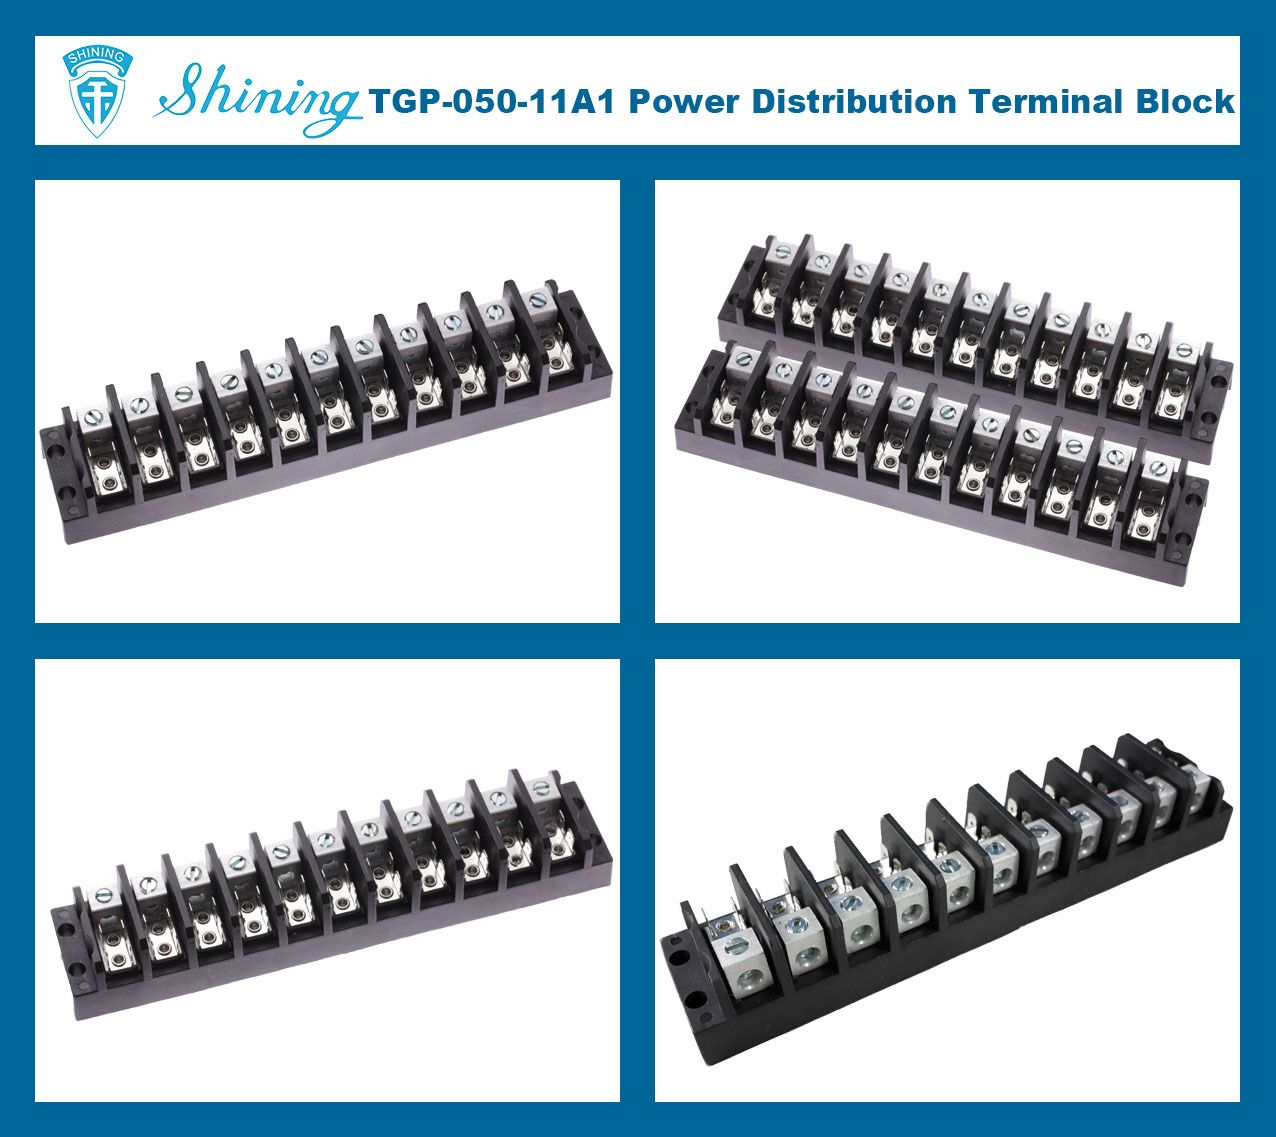 TGP-050-11A1 600V 50A 11 Pole Electrical Power Terminal Block